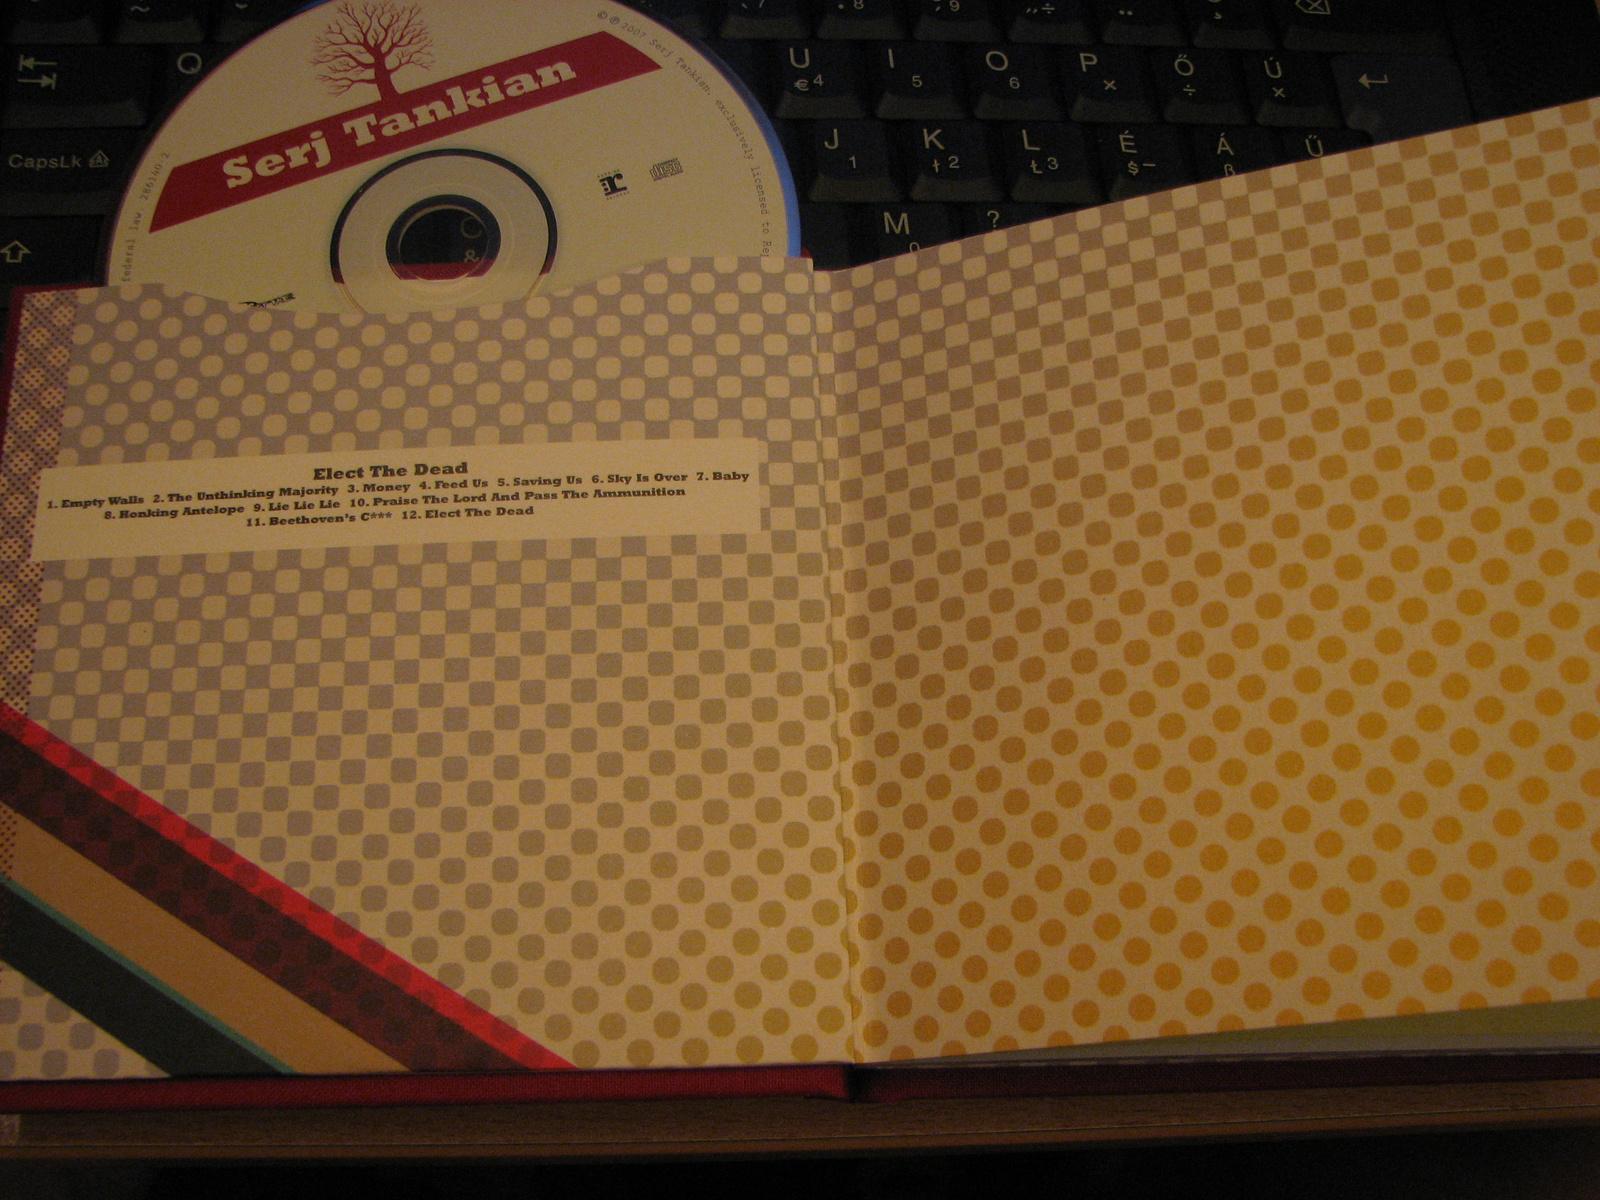 Inlay + CD